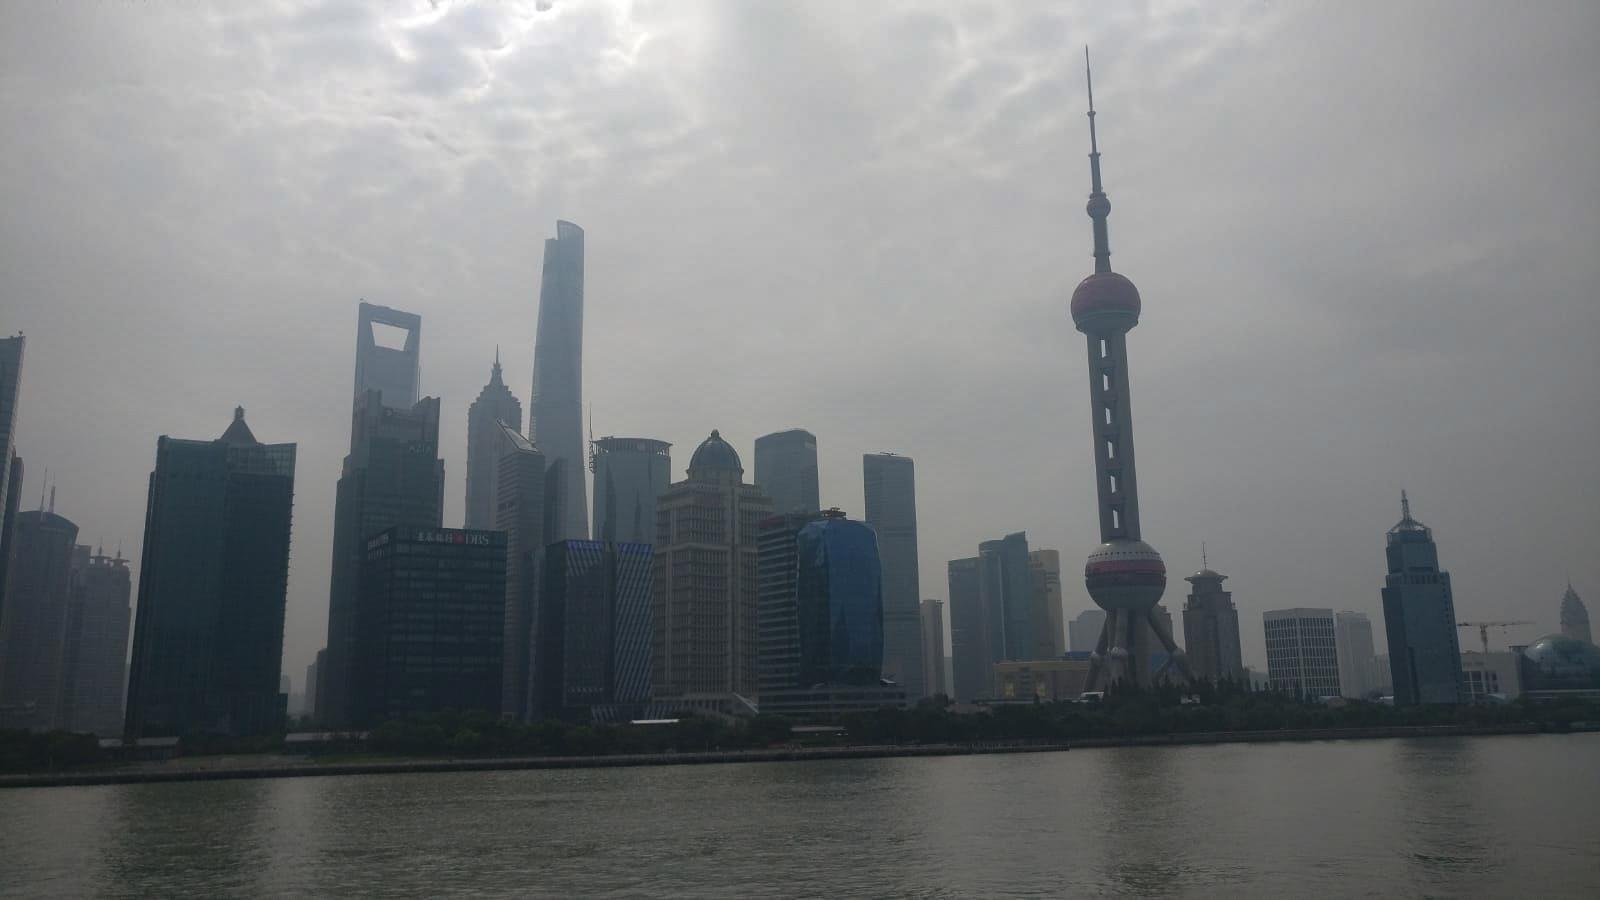 Leaving Shanghai on the ferry.